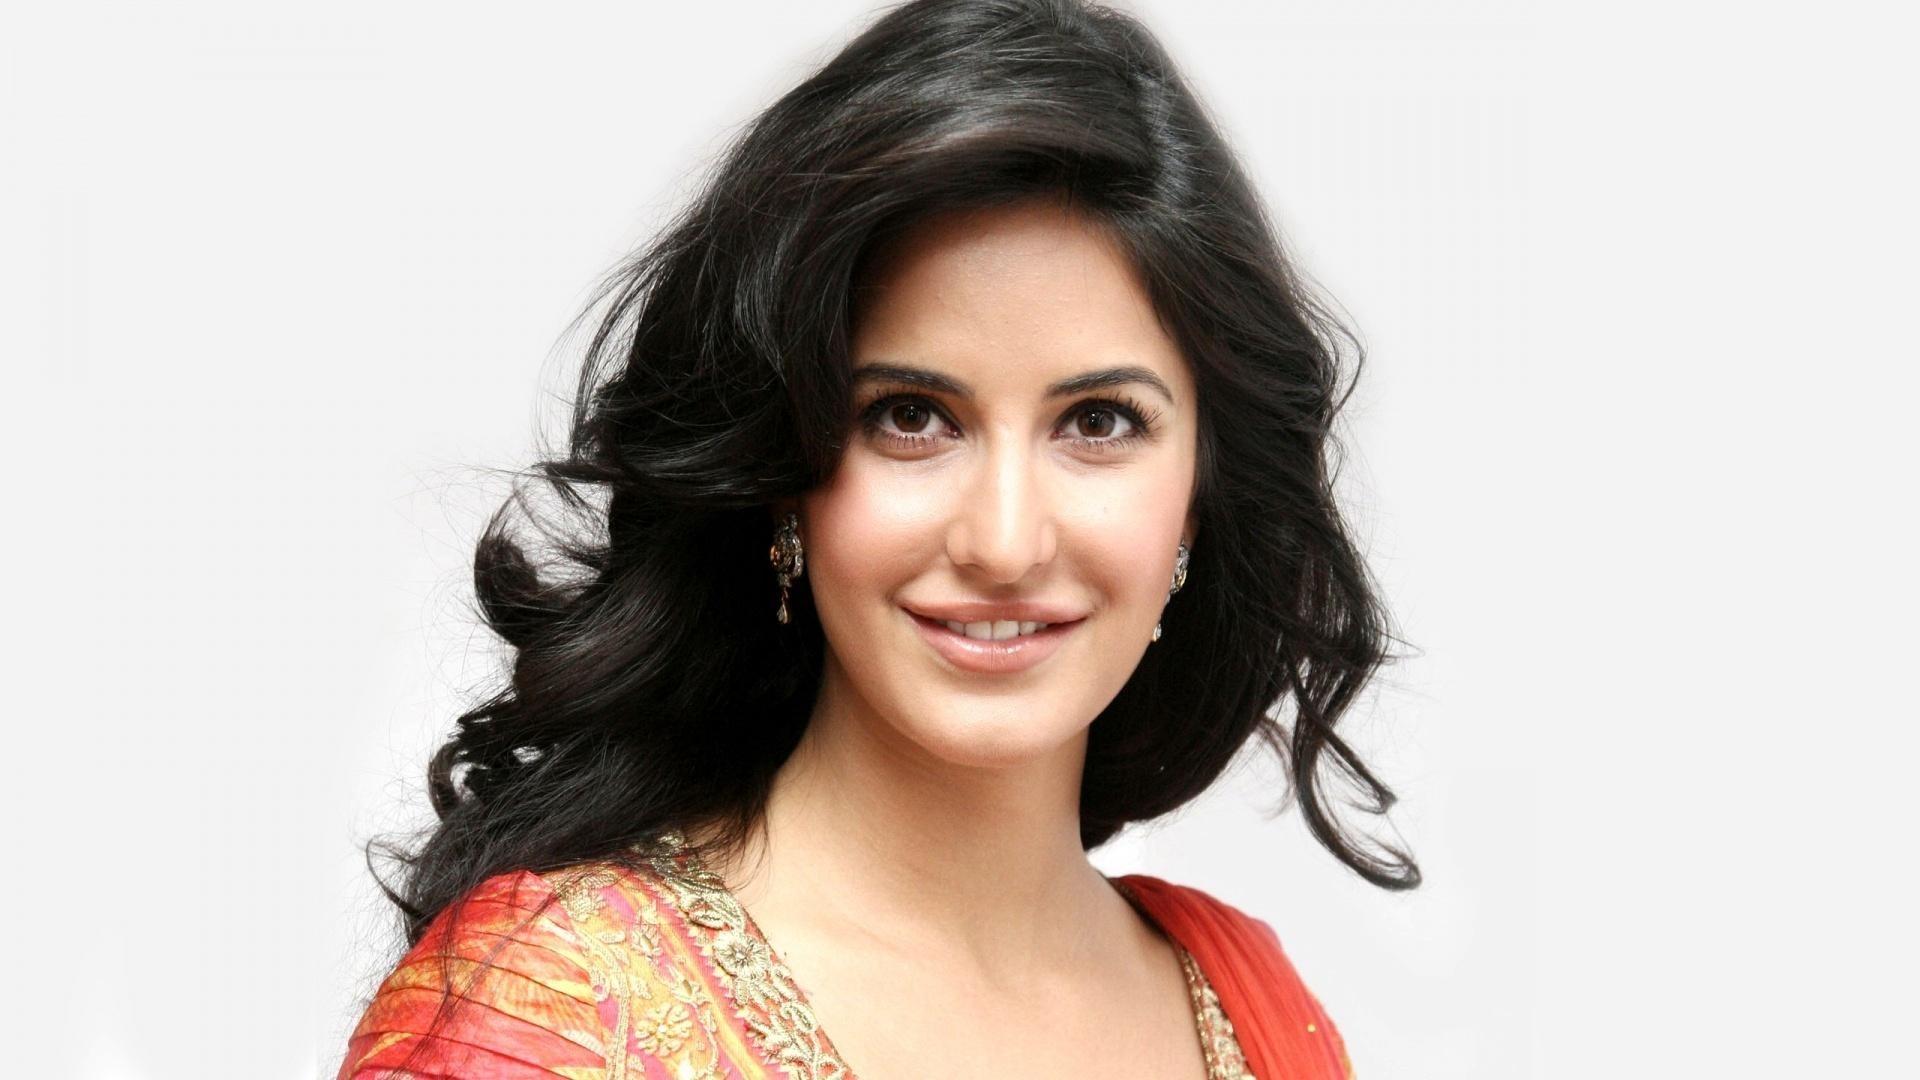 Beautiful Bollywood Actress Katrina Kaif Wallpaper HD Wallpapers 1920x1080